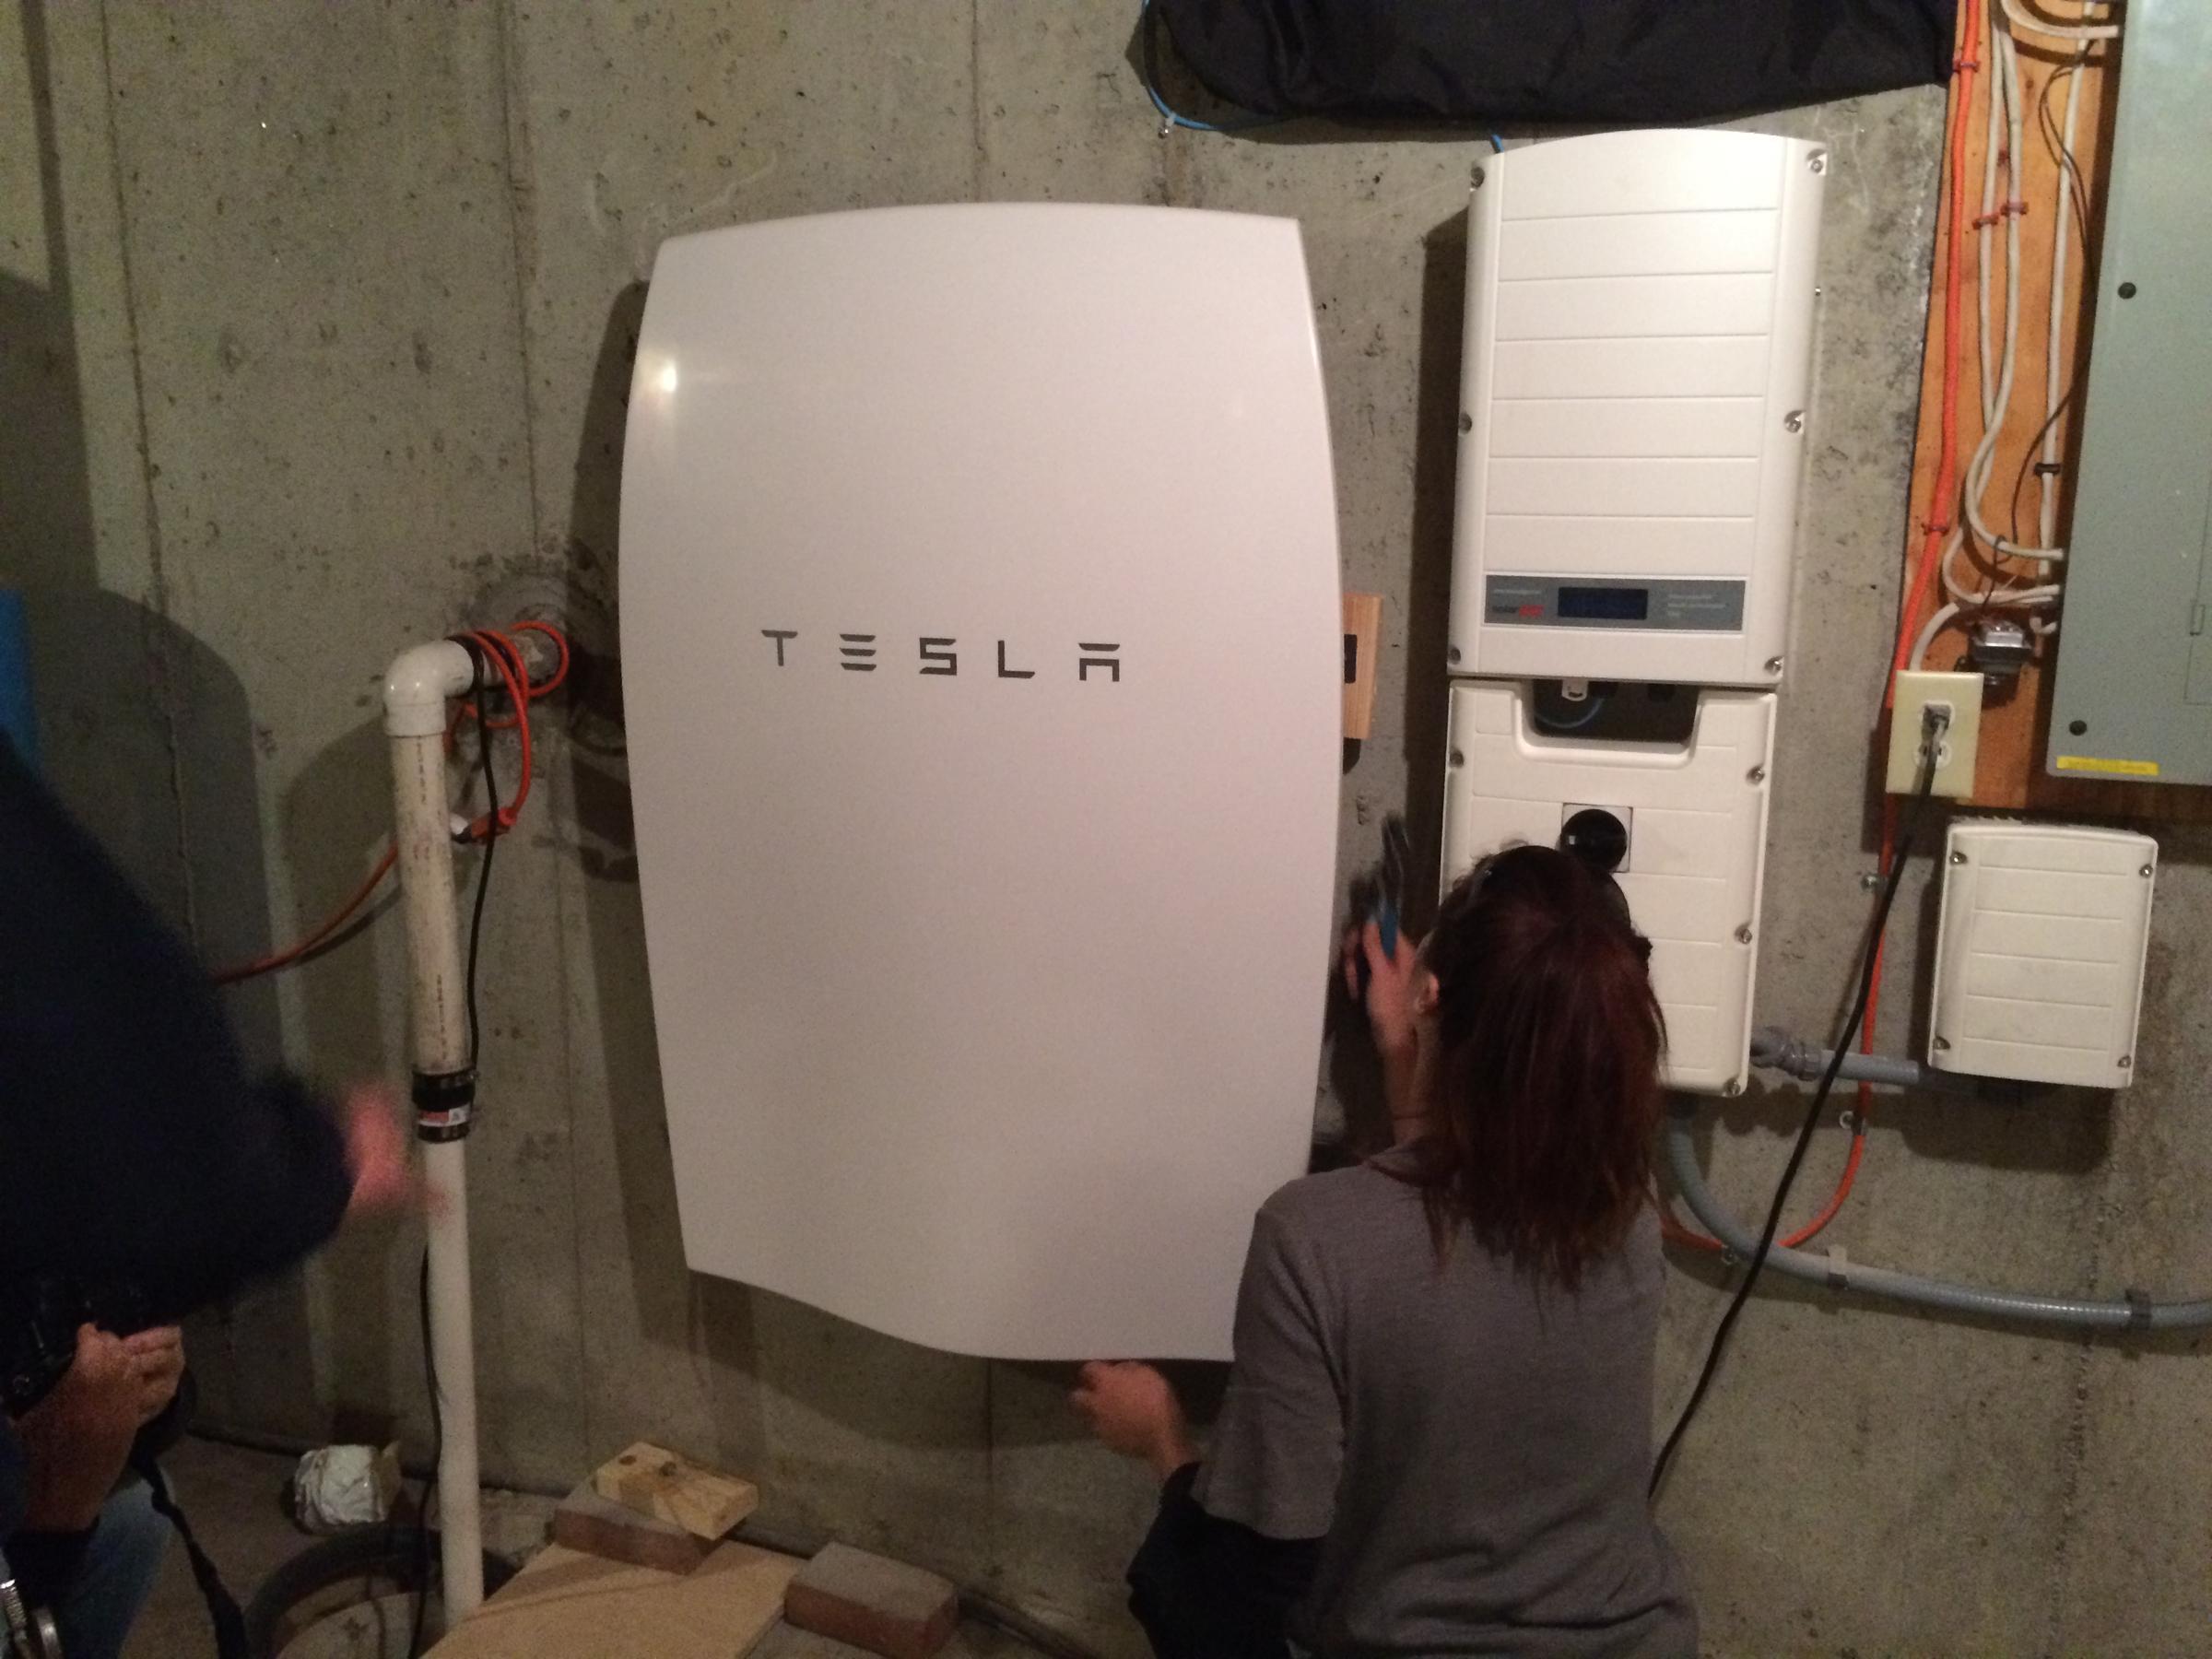 Vermont Utility Starts Installing Tesla Home Batteries Wamc